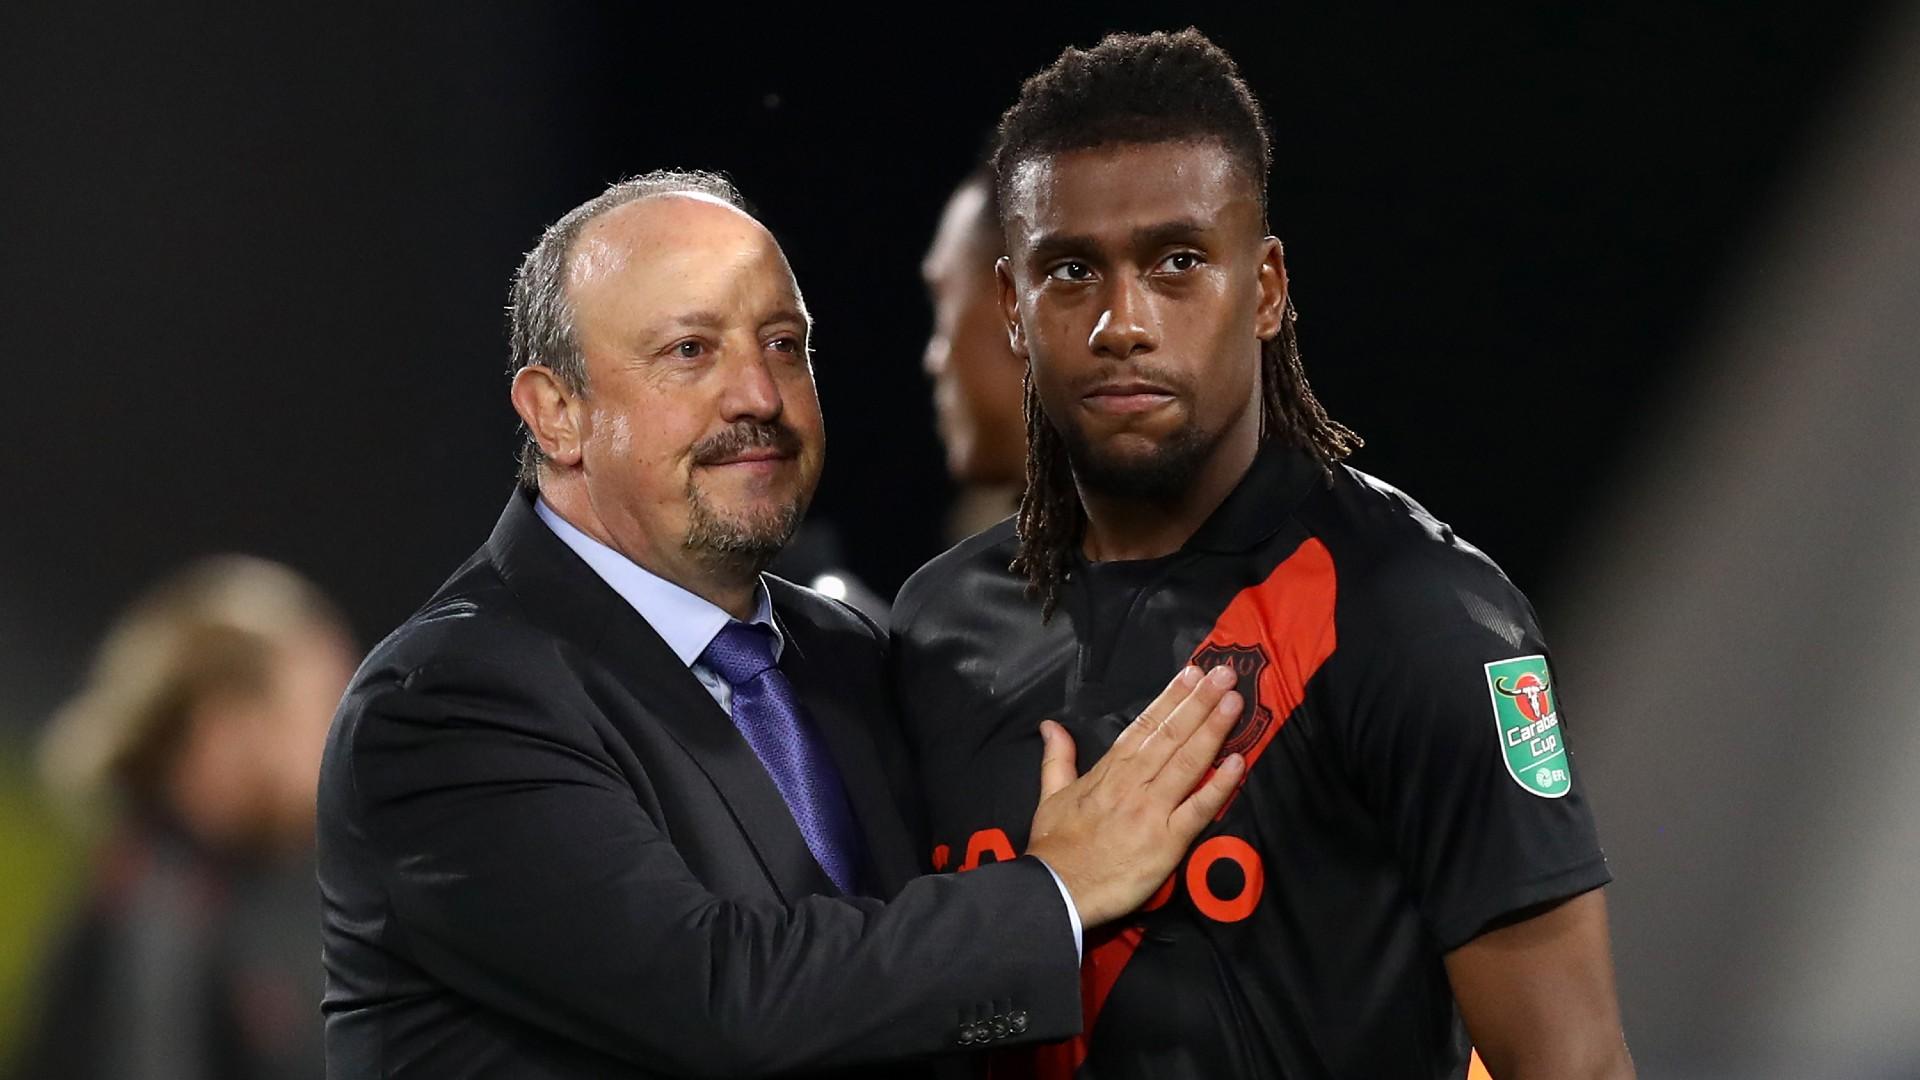 Everton boss Rafael Benitez welcomes Alex Iwobi back to training